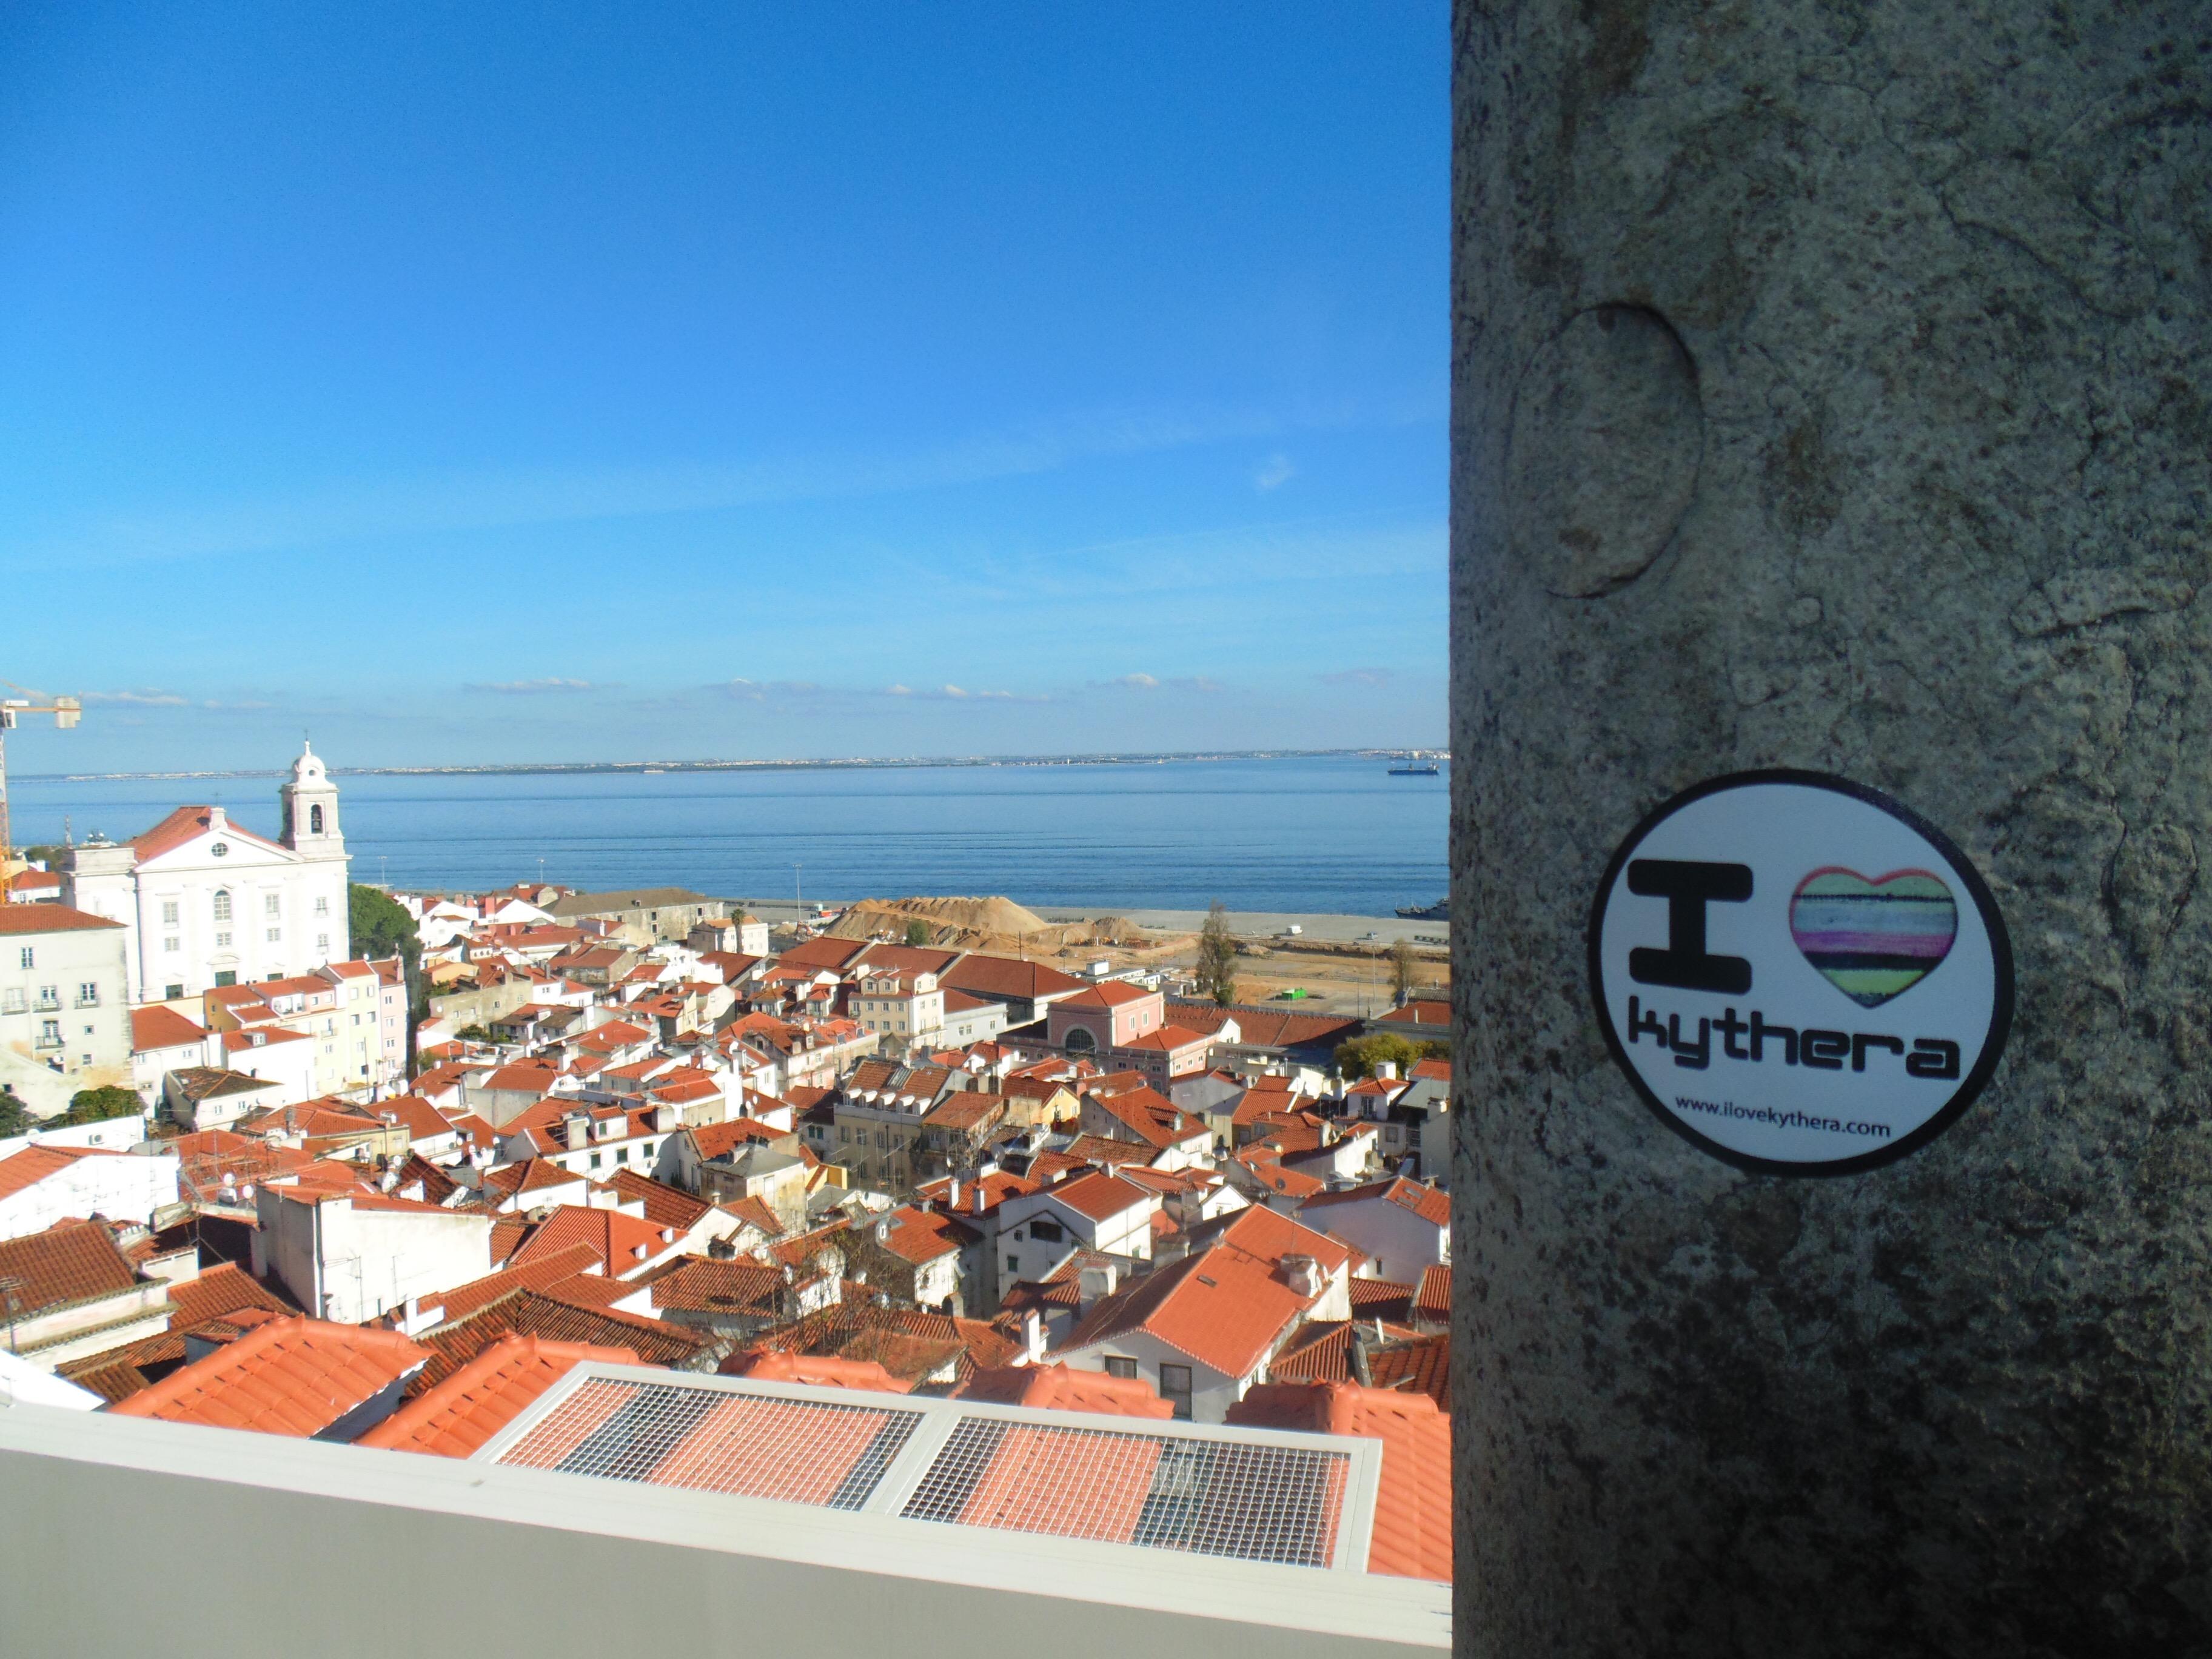 I love Kythera sticker, Portugal